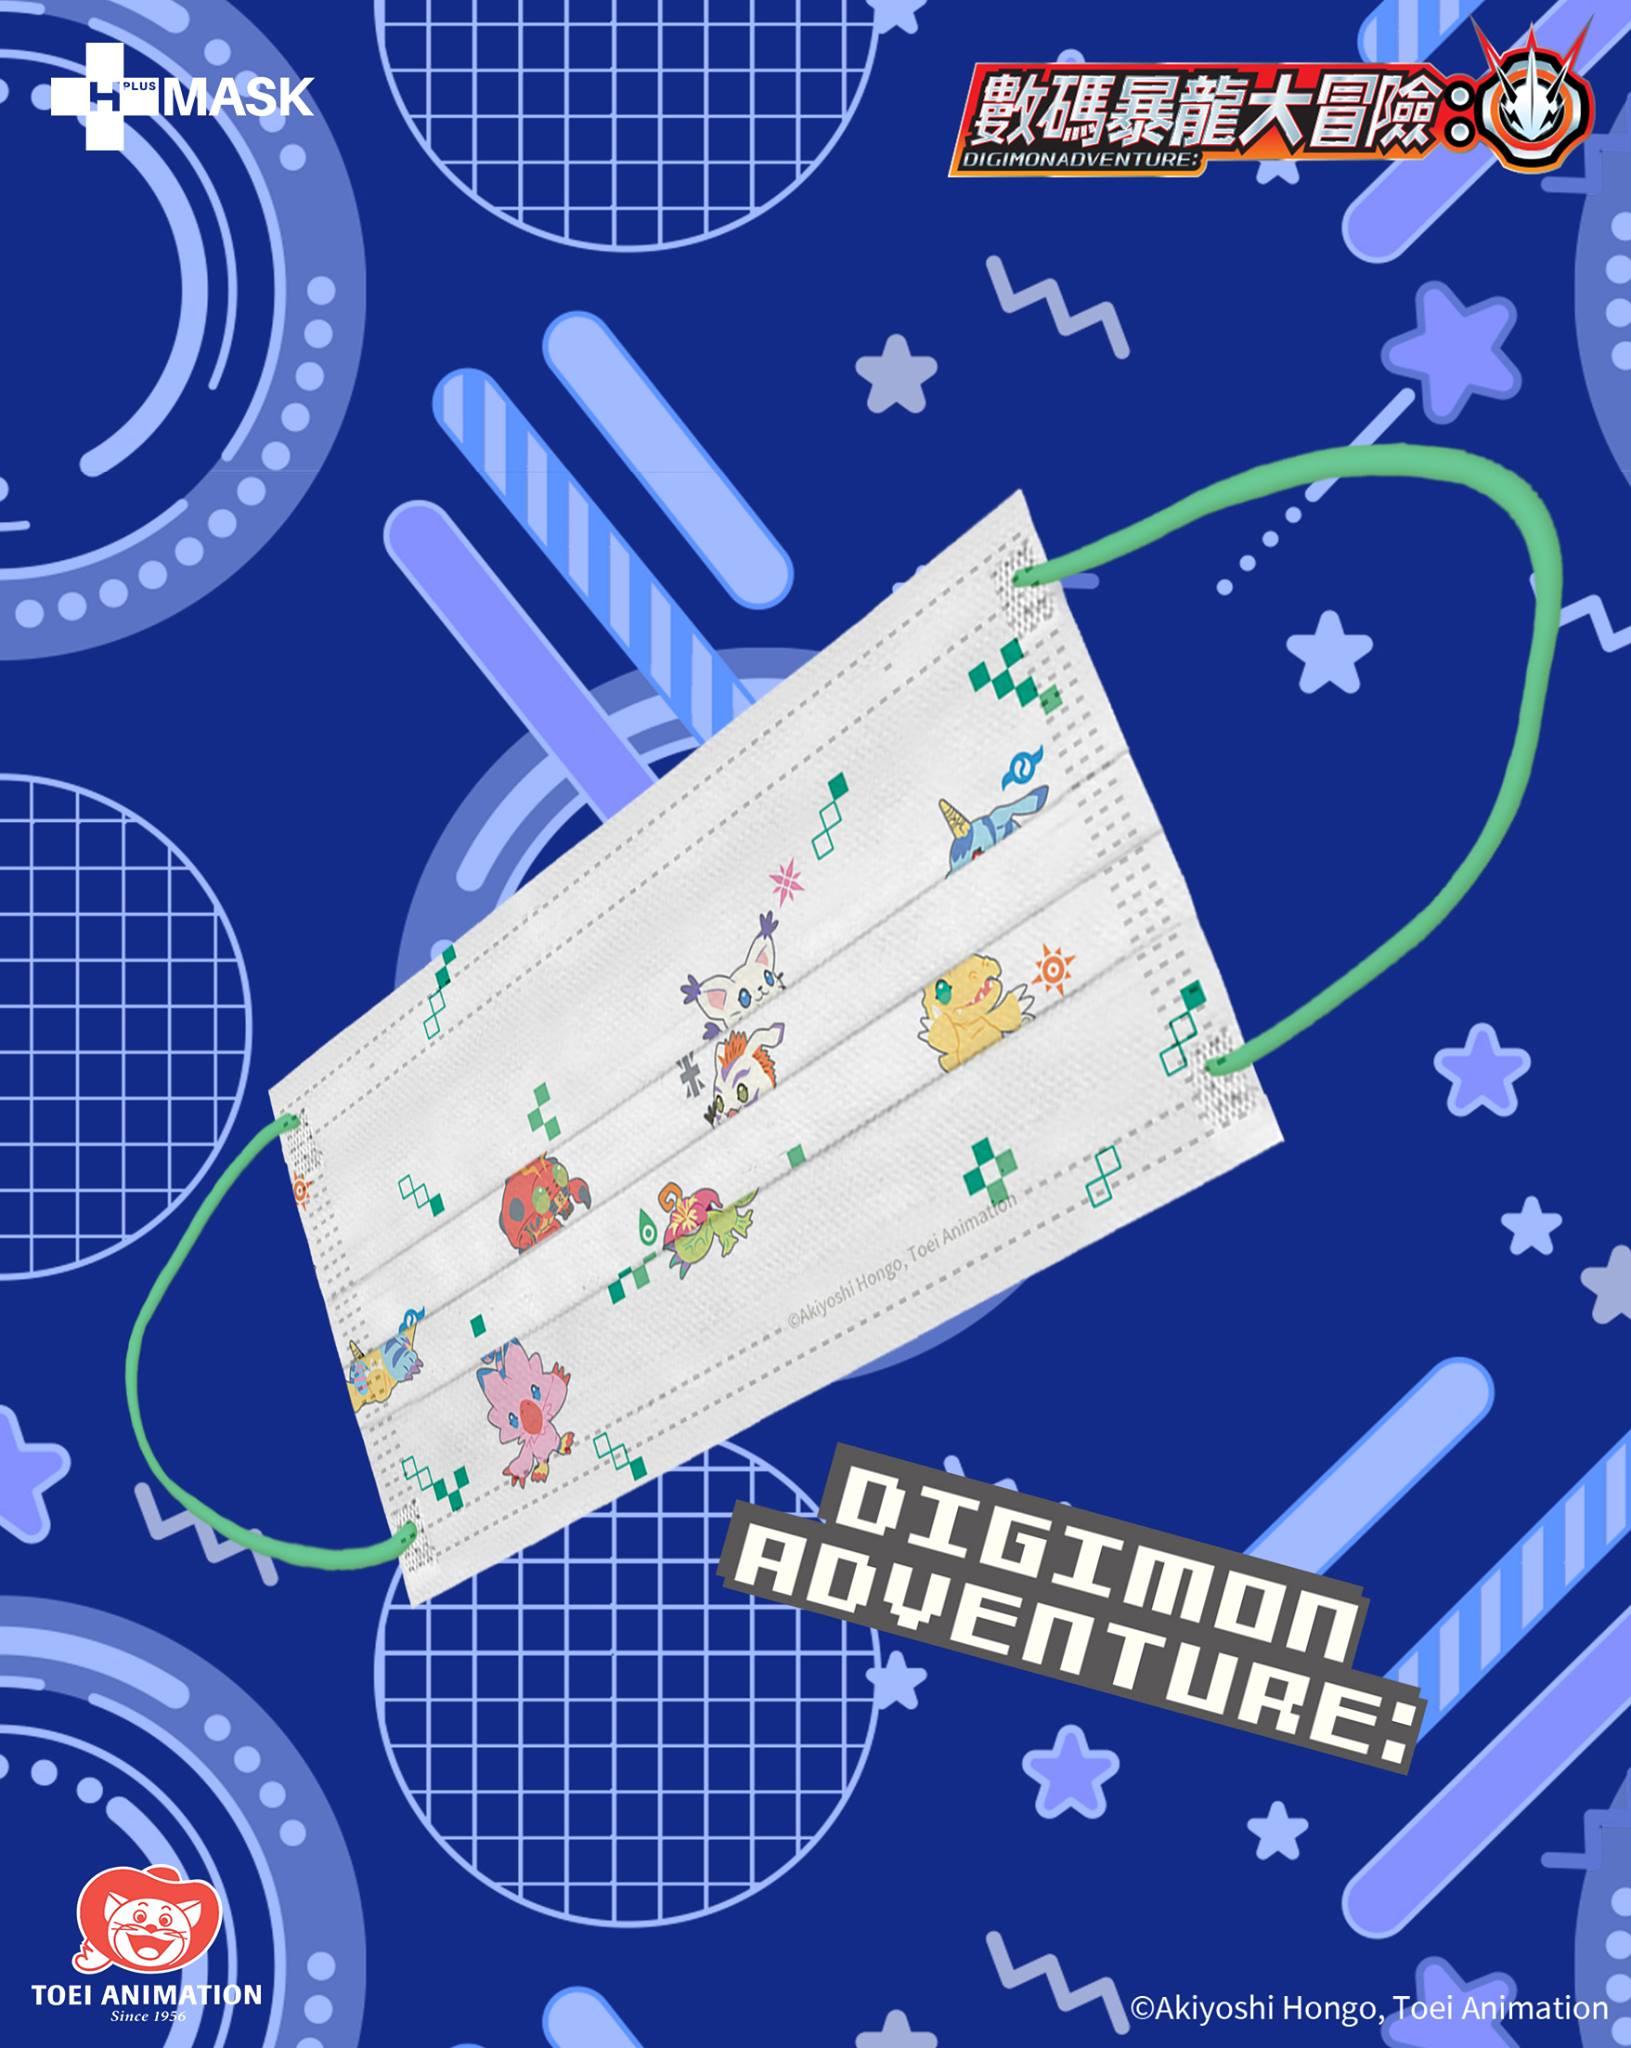 hkadventure2020masks03_march27_2021.jpg